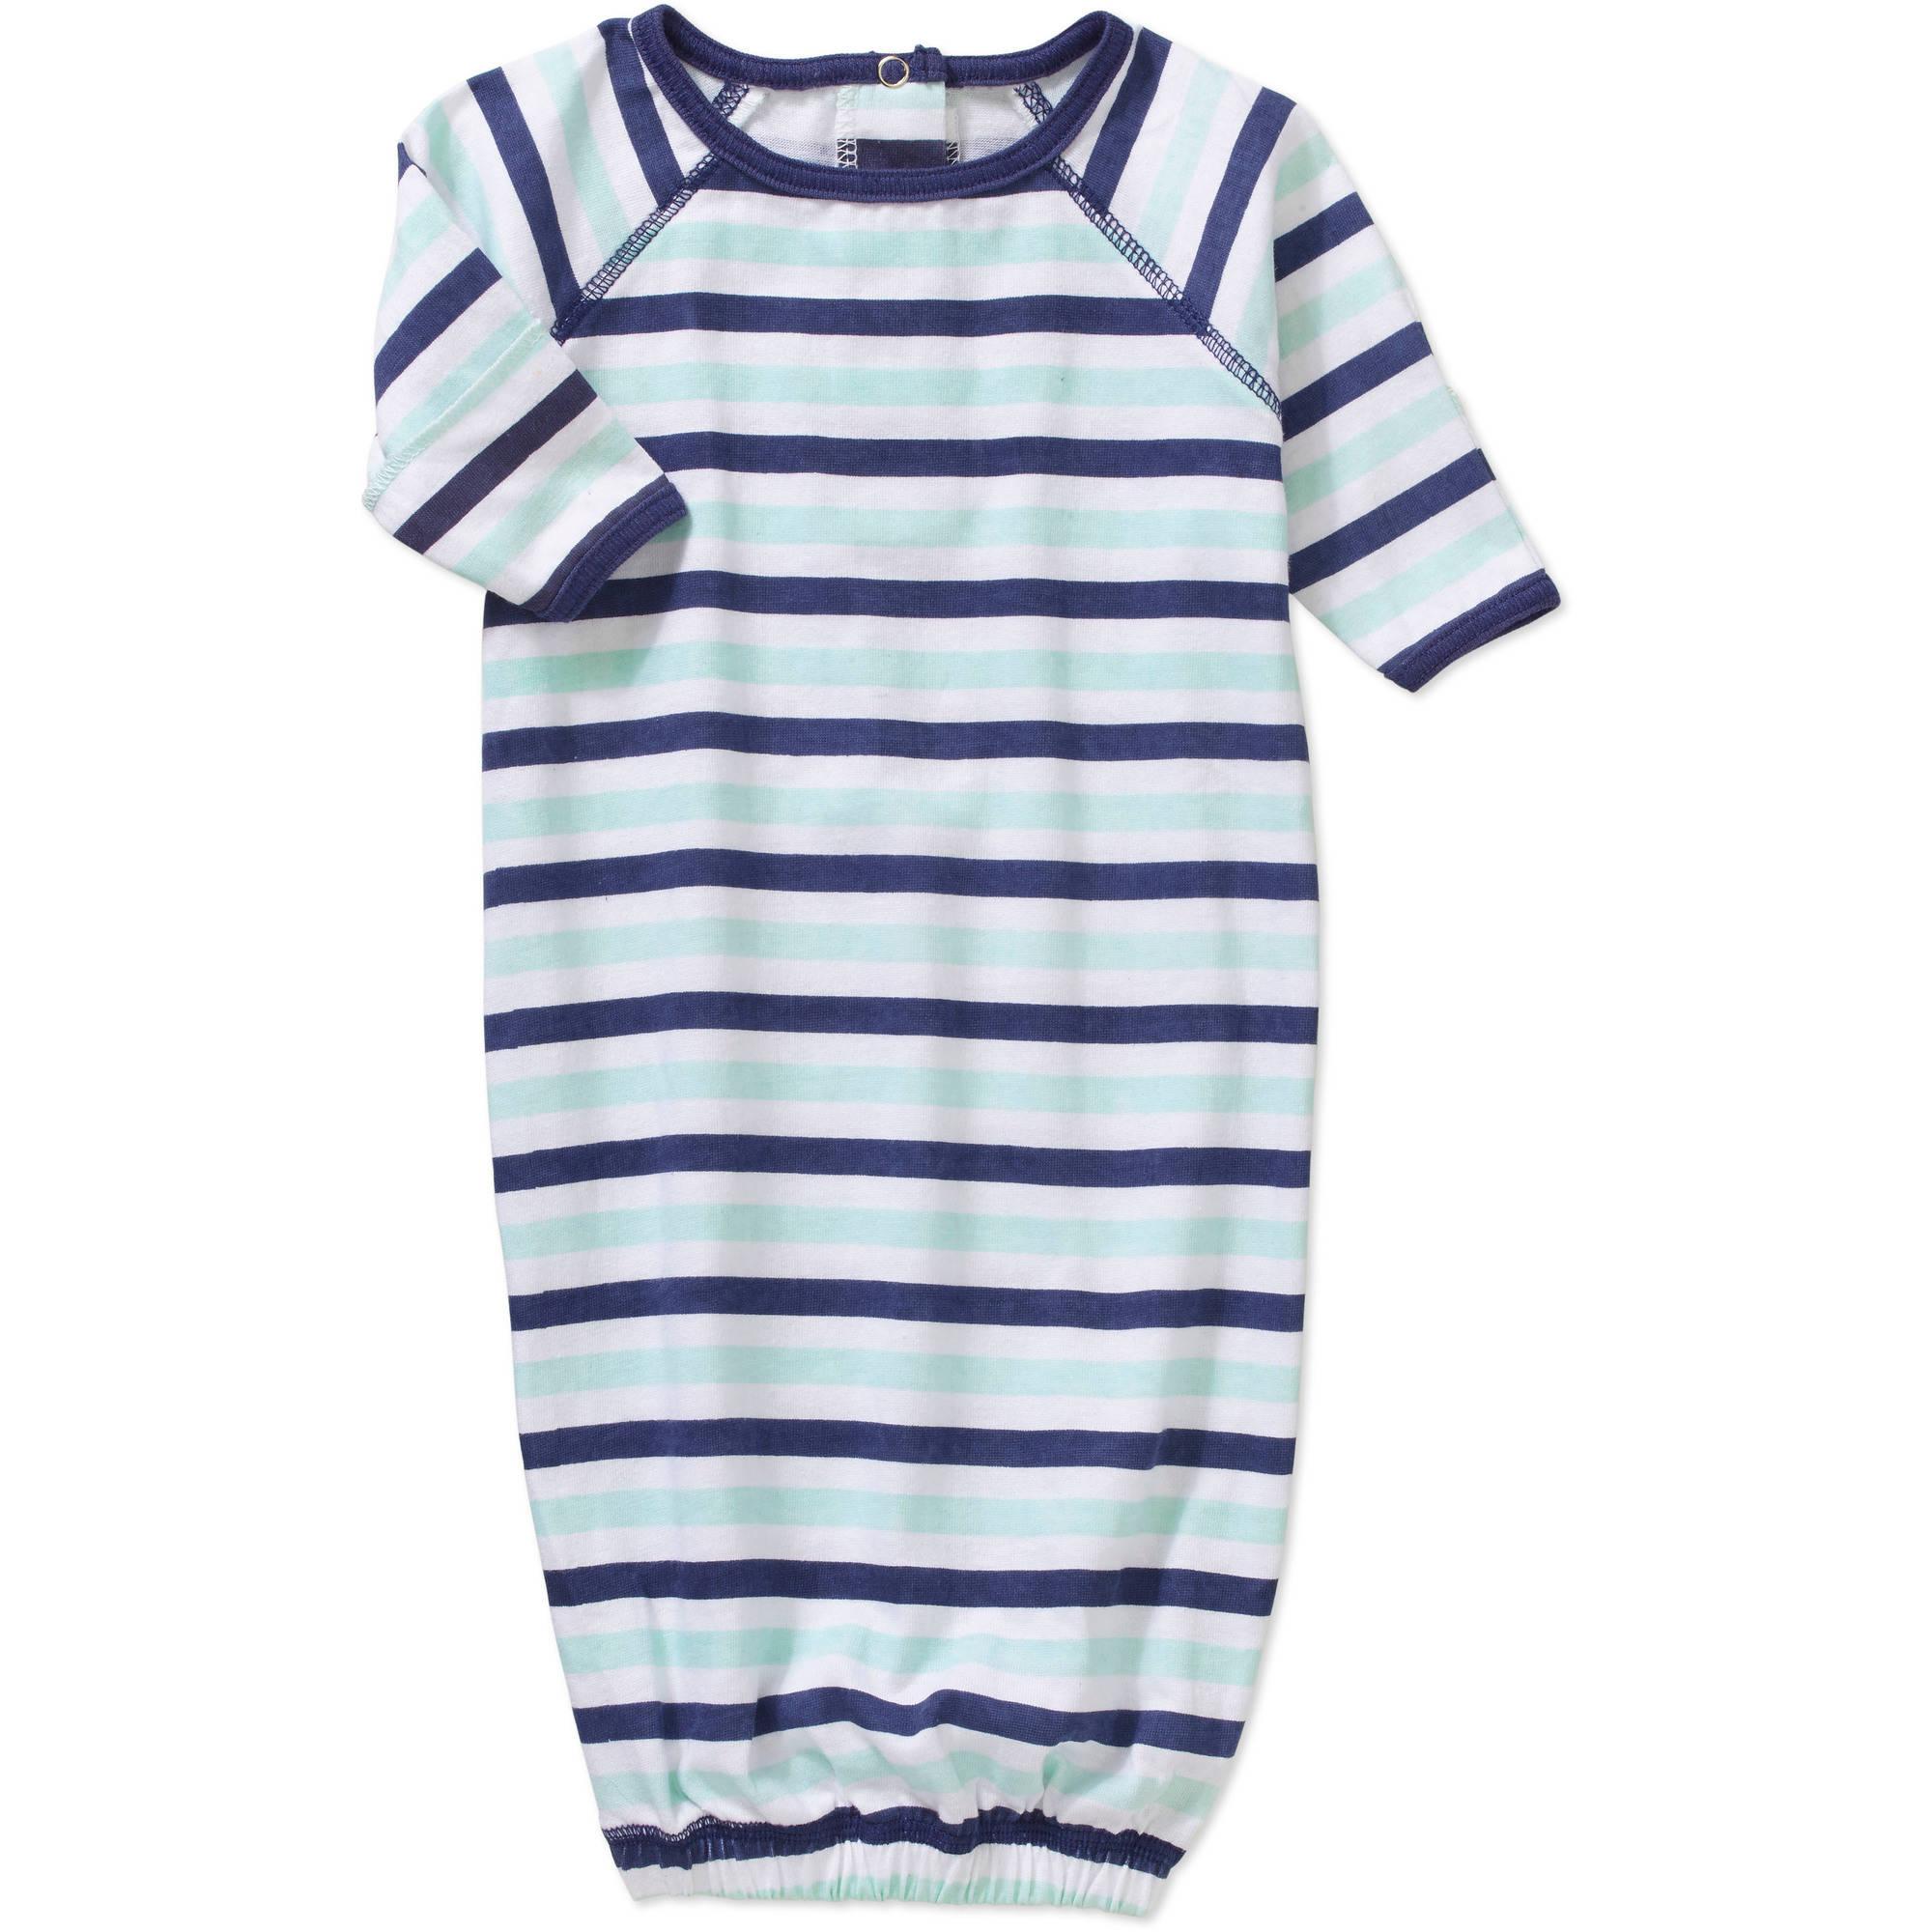 Introspect Newborn Baby Boy Sleep Gown